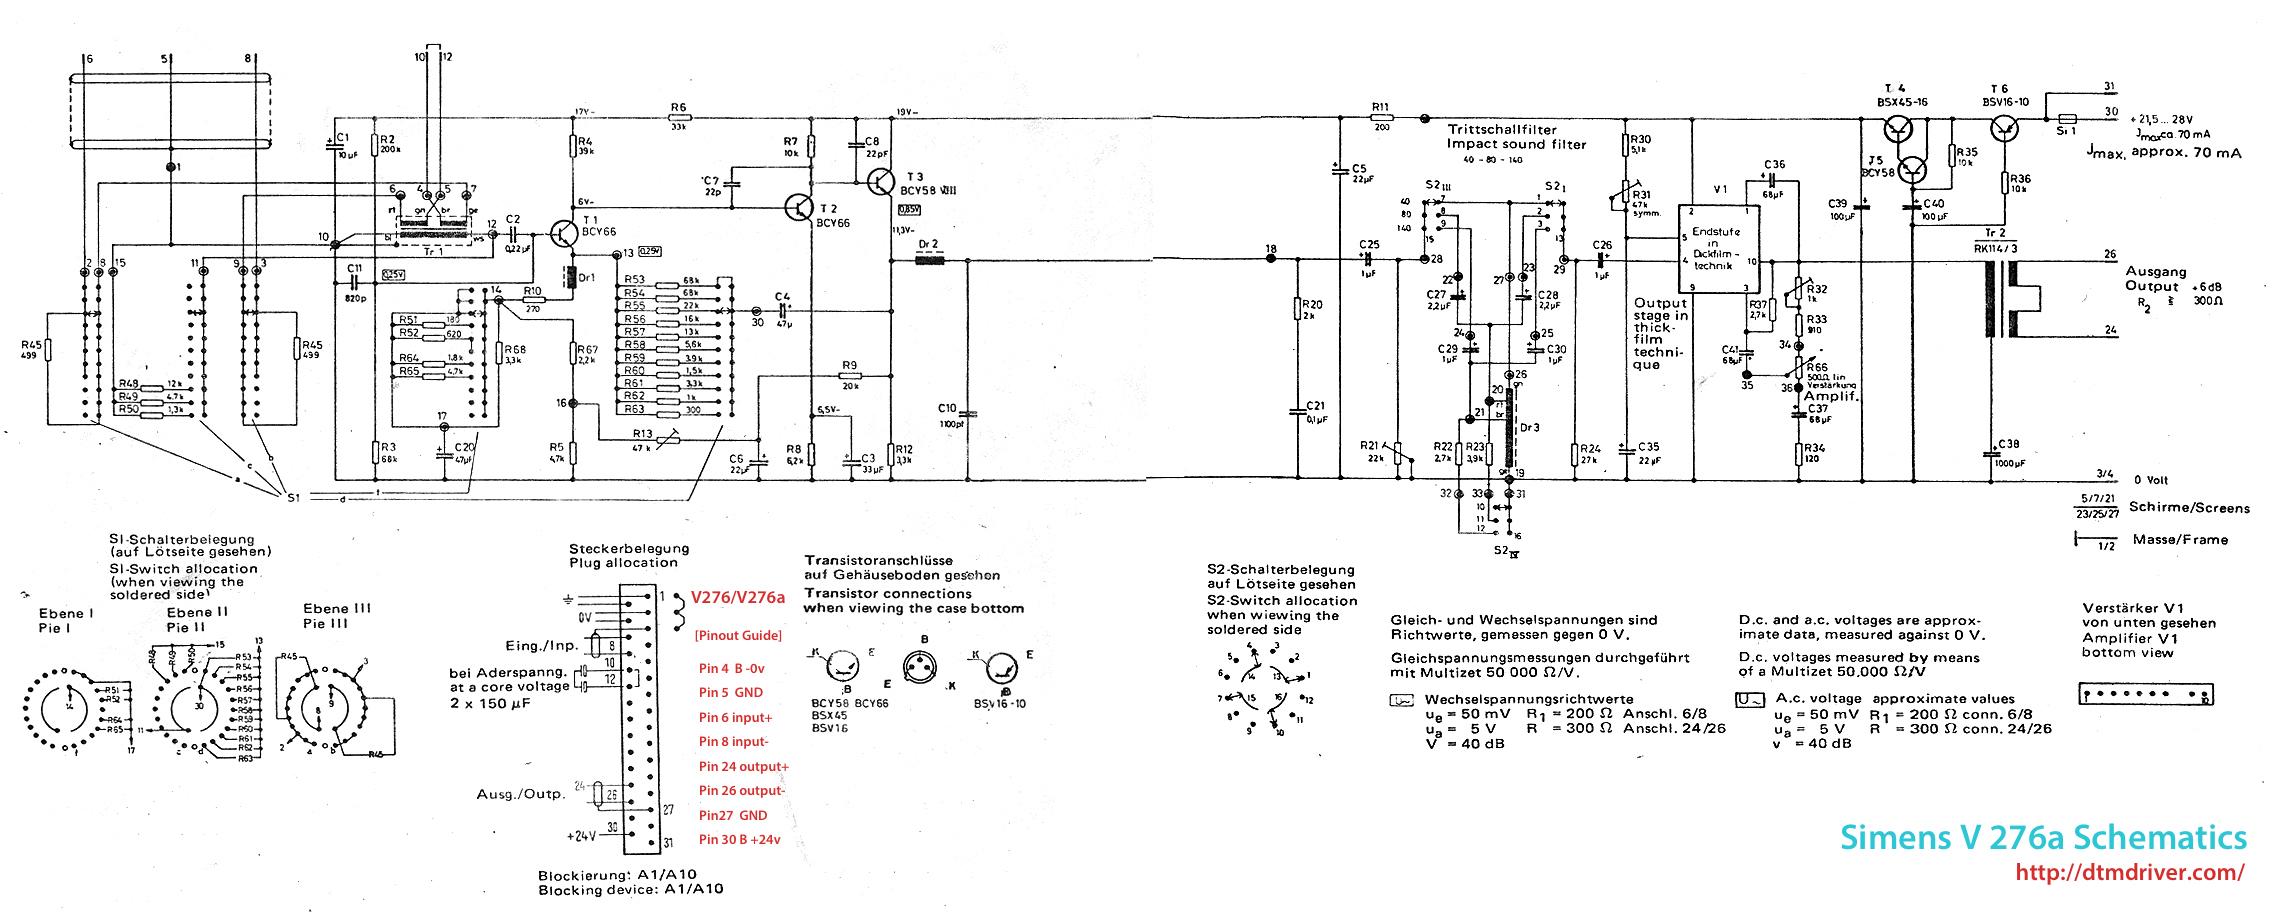 SiemensV276a